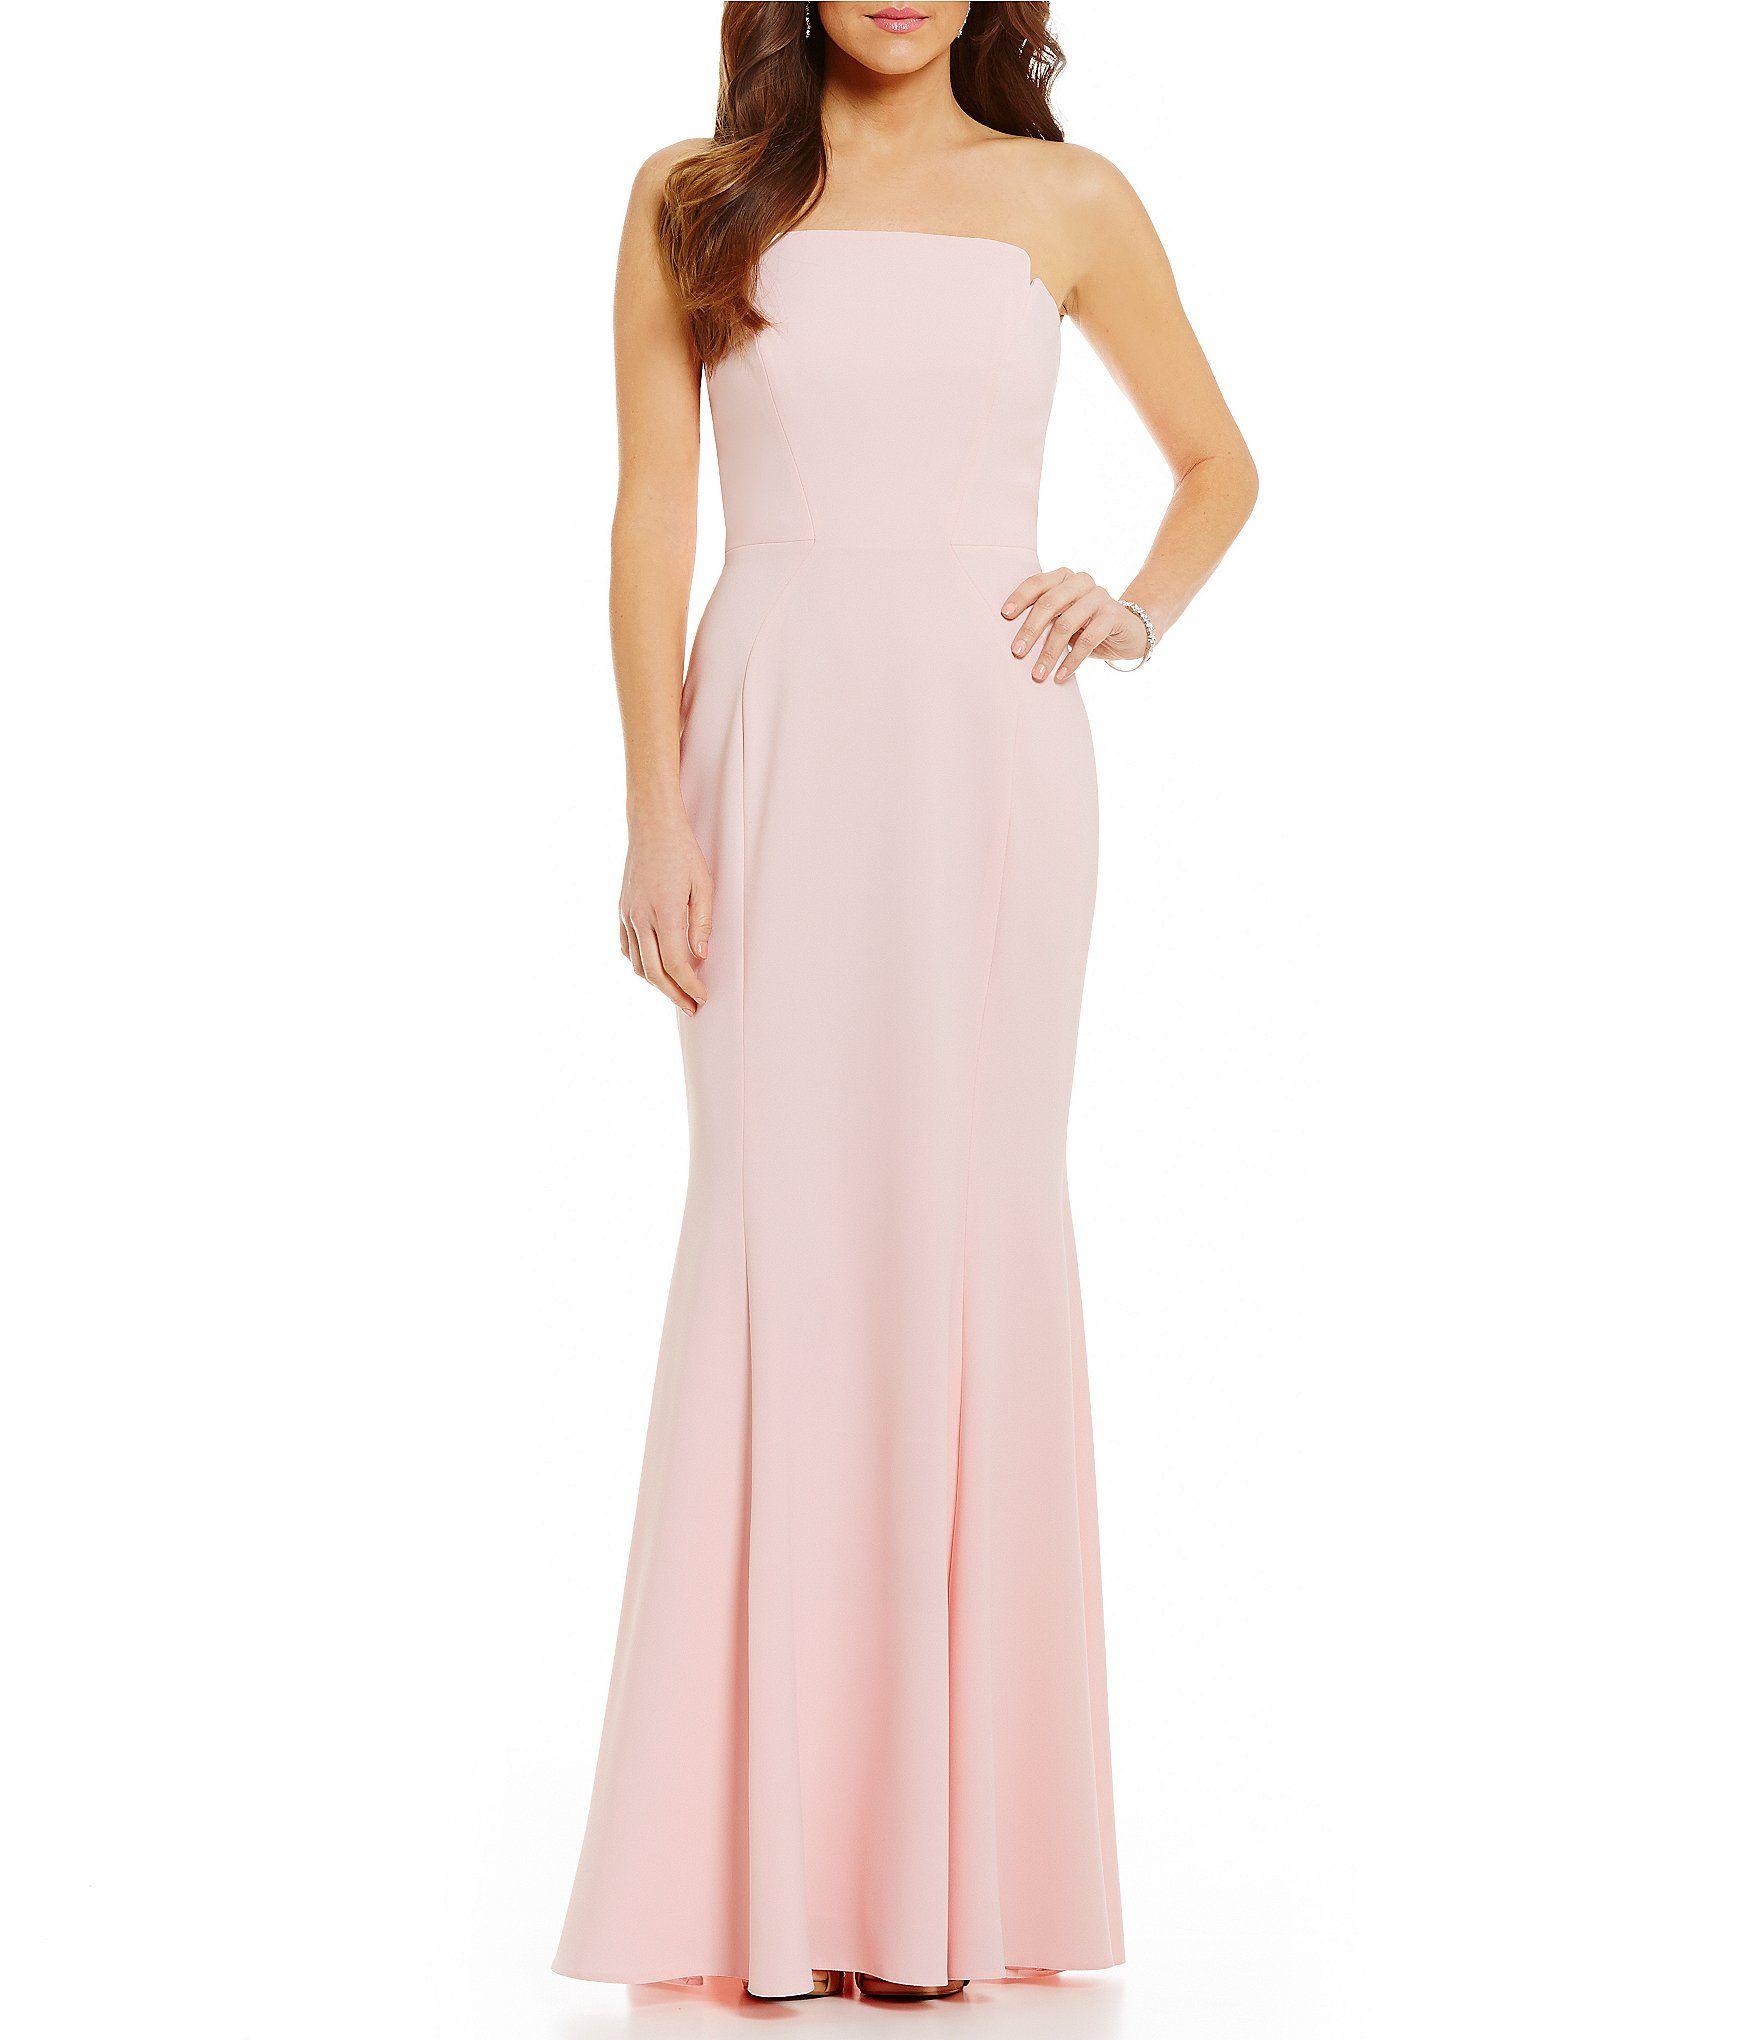 Shop for jill jill stuart long strapless fitted gown at dillards